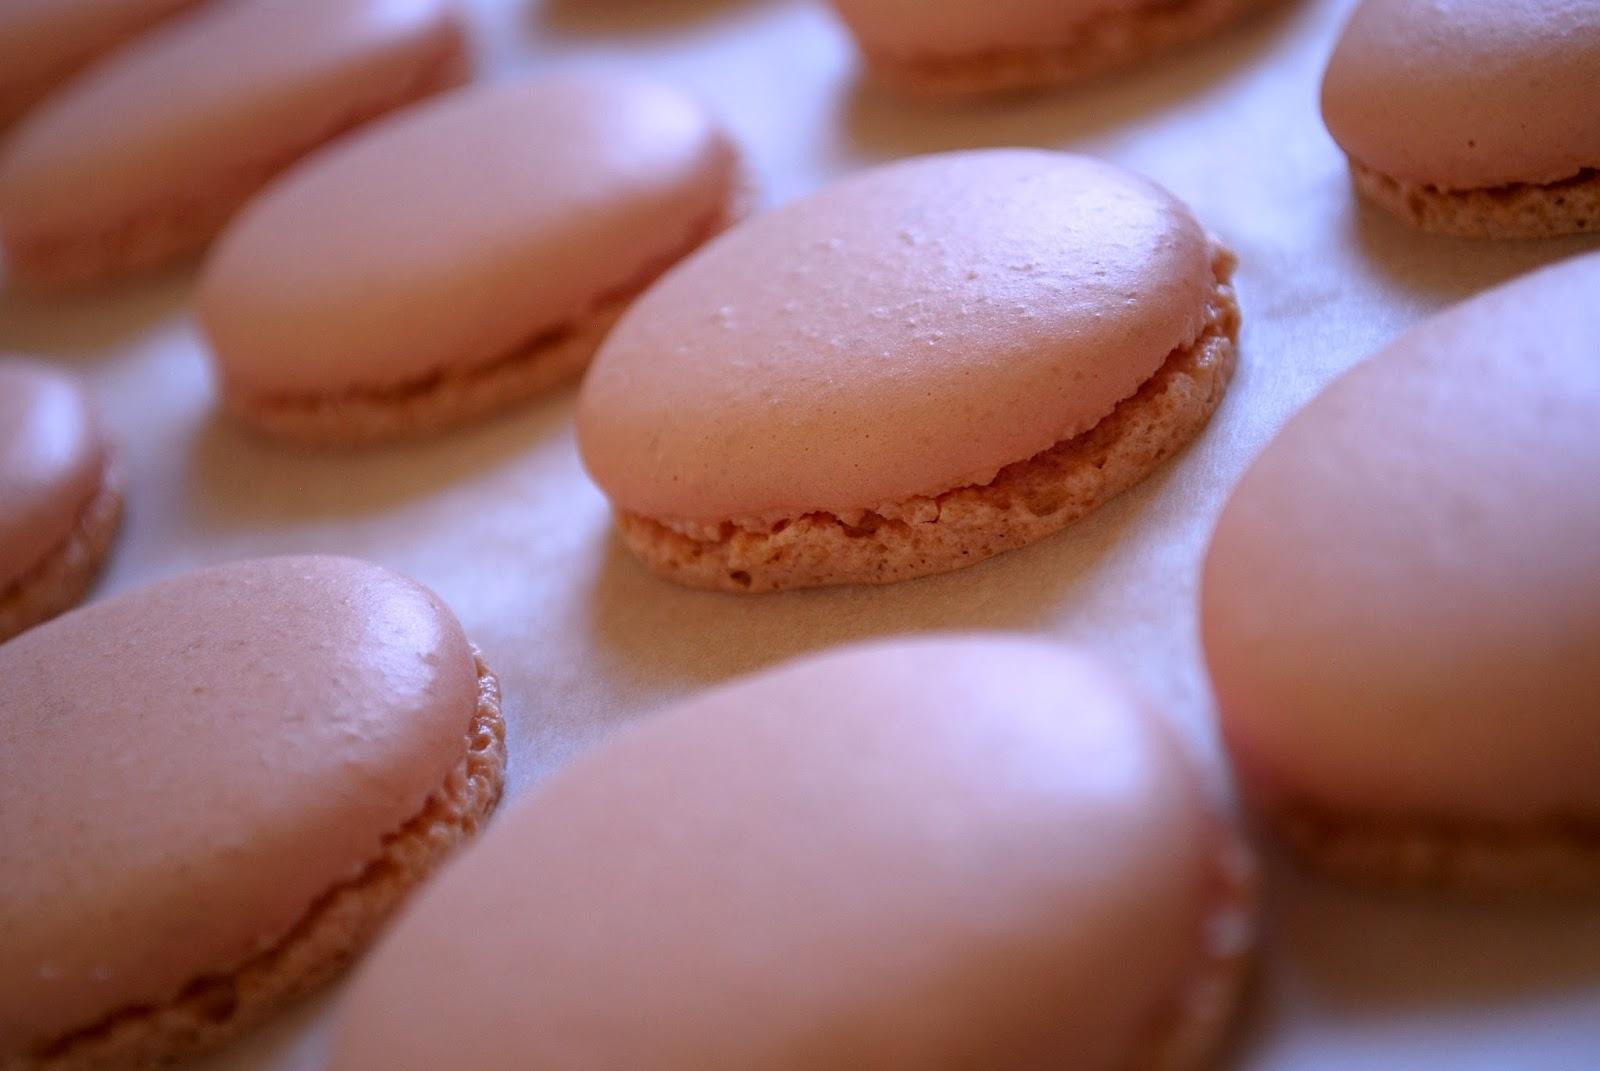 Invitation au fait maison: Macarons roses au chocolat